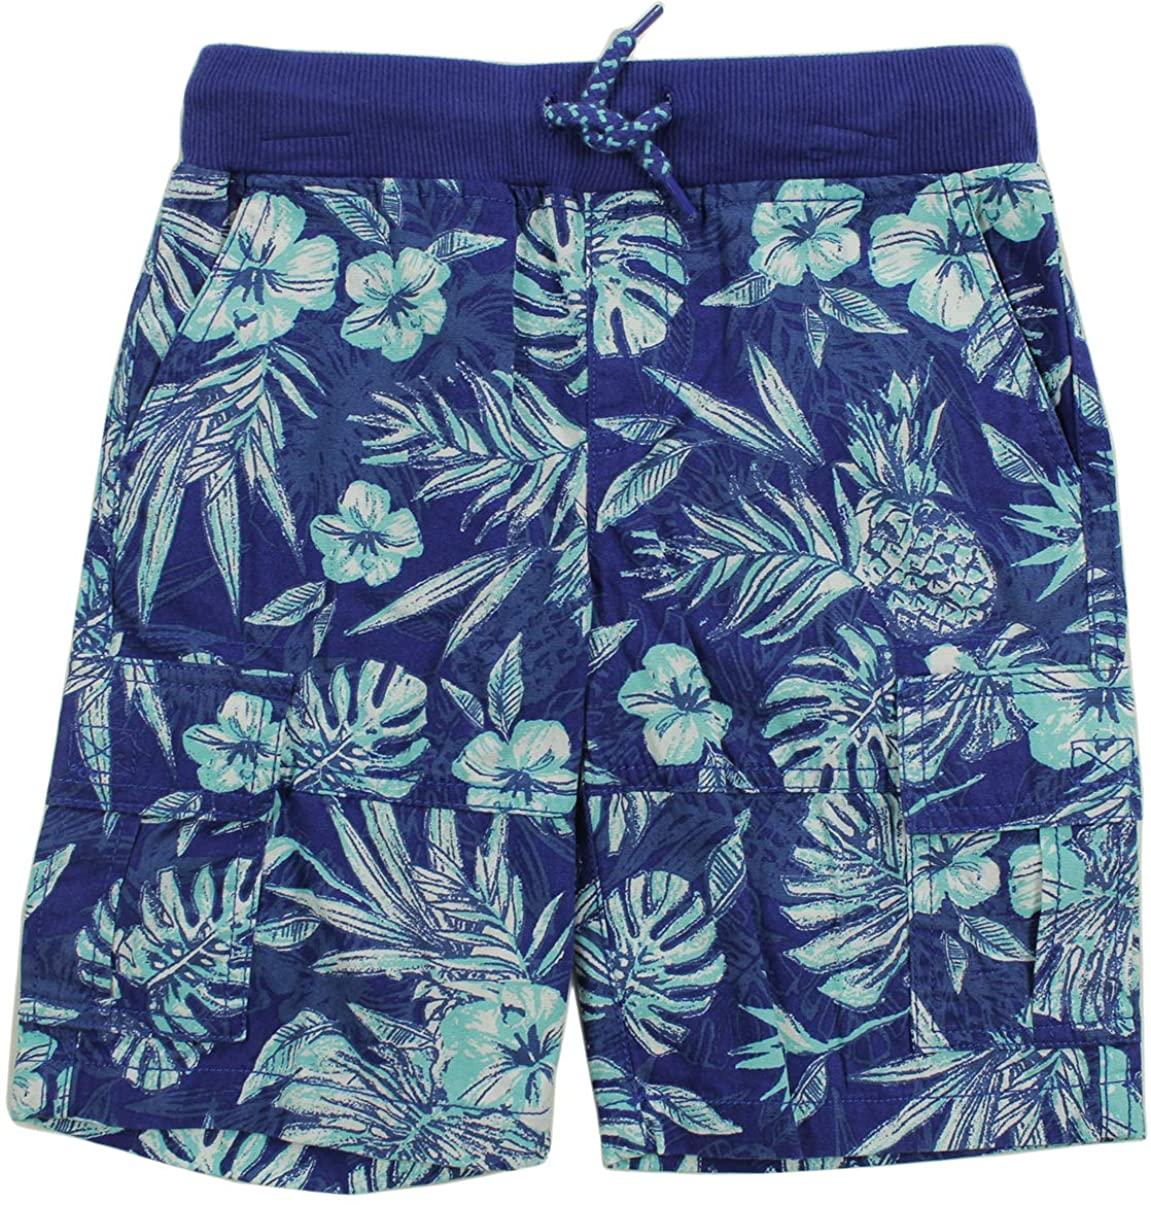 Epic Threads Toddler Boys Drawstring Tropical Print Blue Cargo Shorts 3T